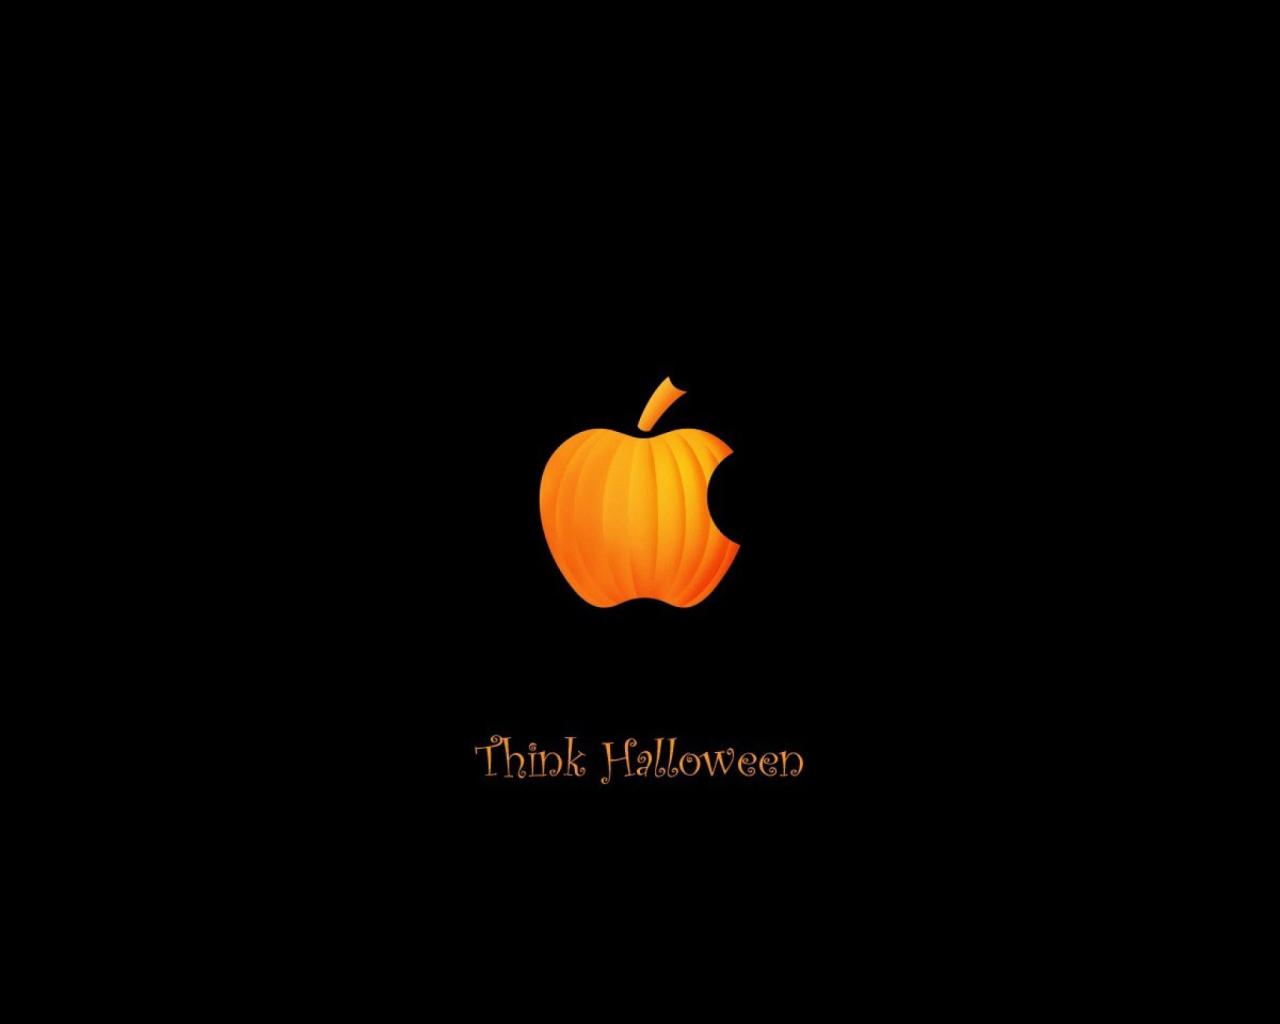 Free Download Halloween Pumpkins Apple Ipad Air Wallpaper Download